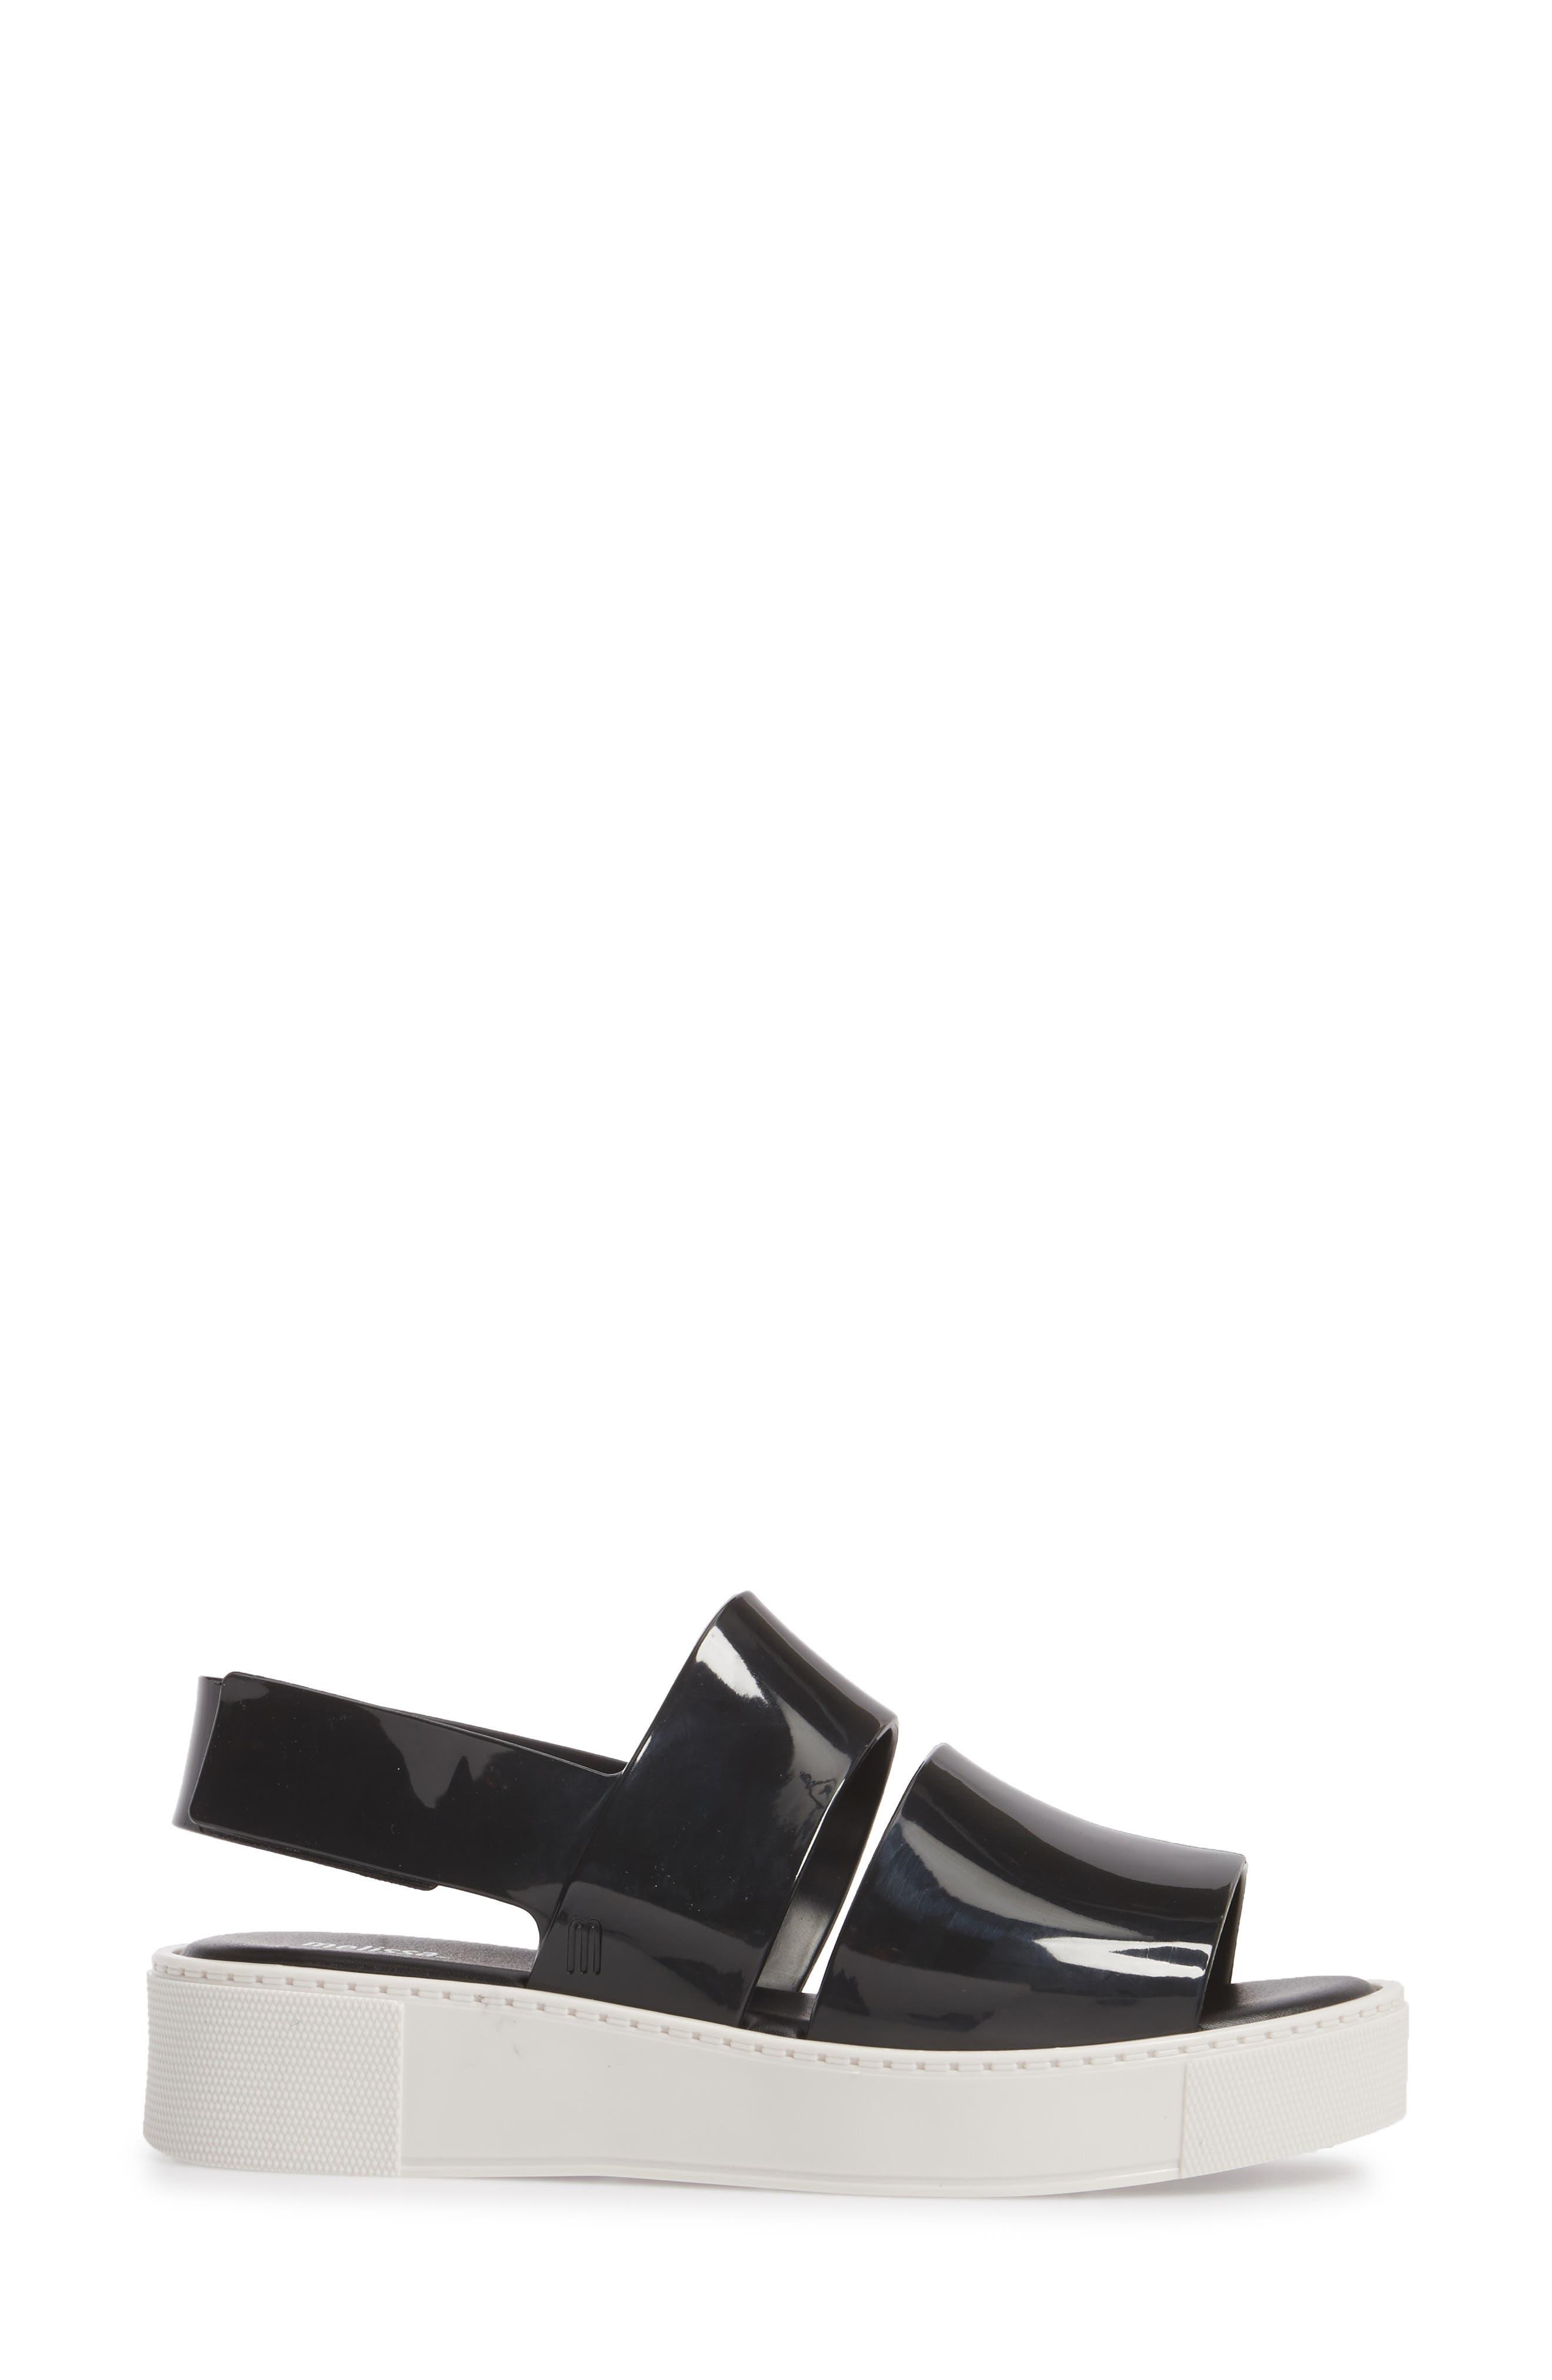 Soho Platform Sandal,                             Alternate thumbnail 3, color,                             001